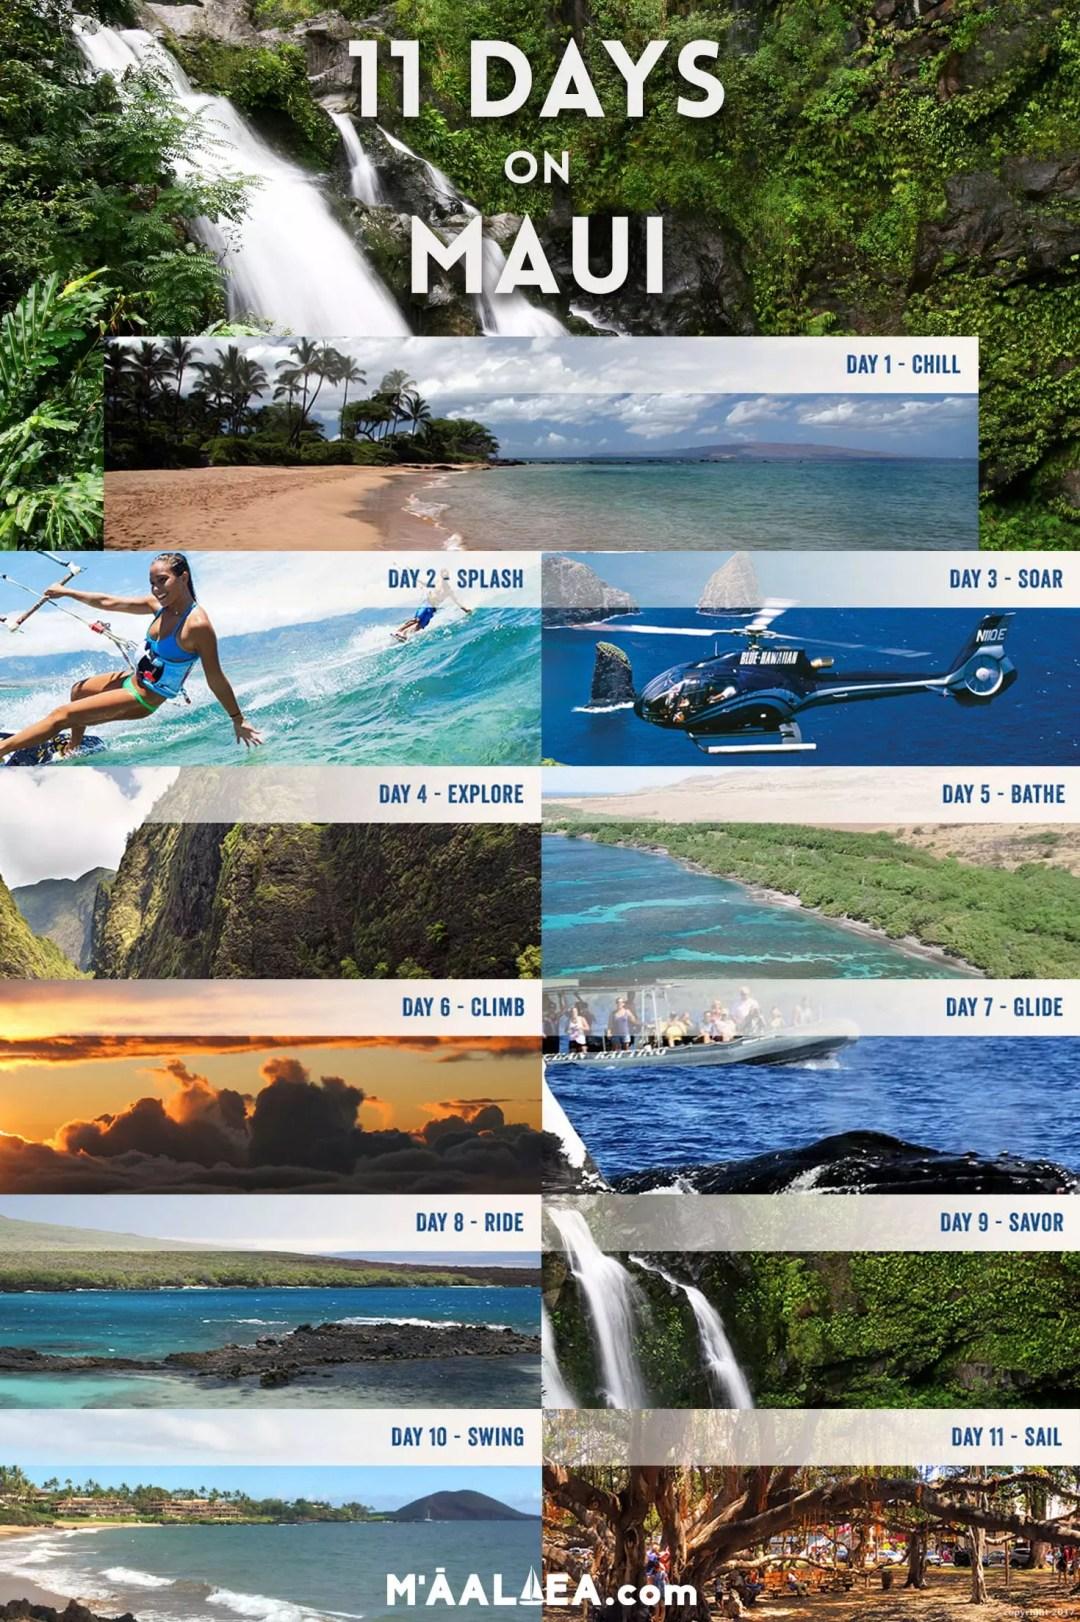 11 day Maui itinerary